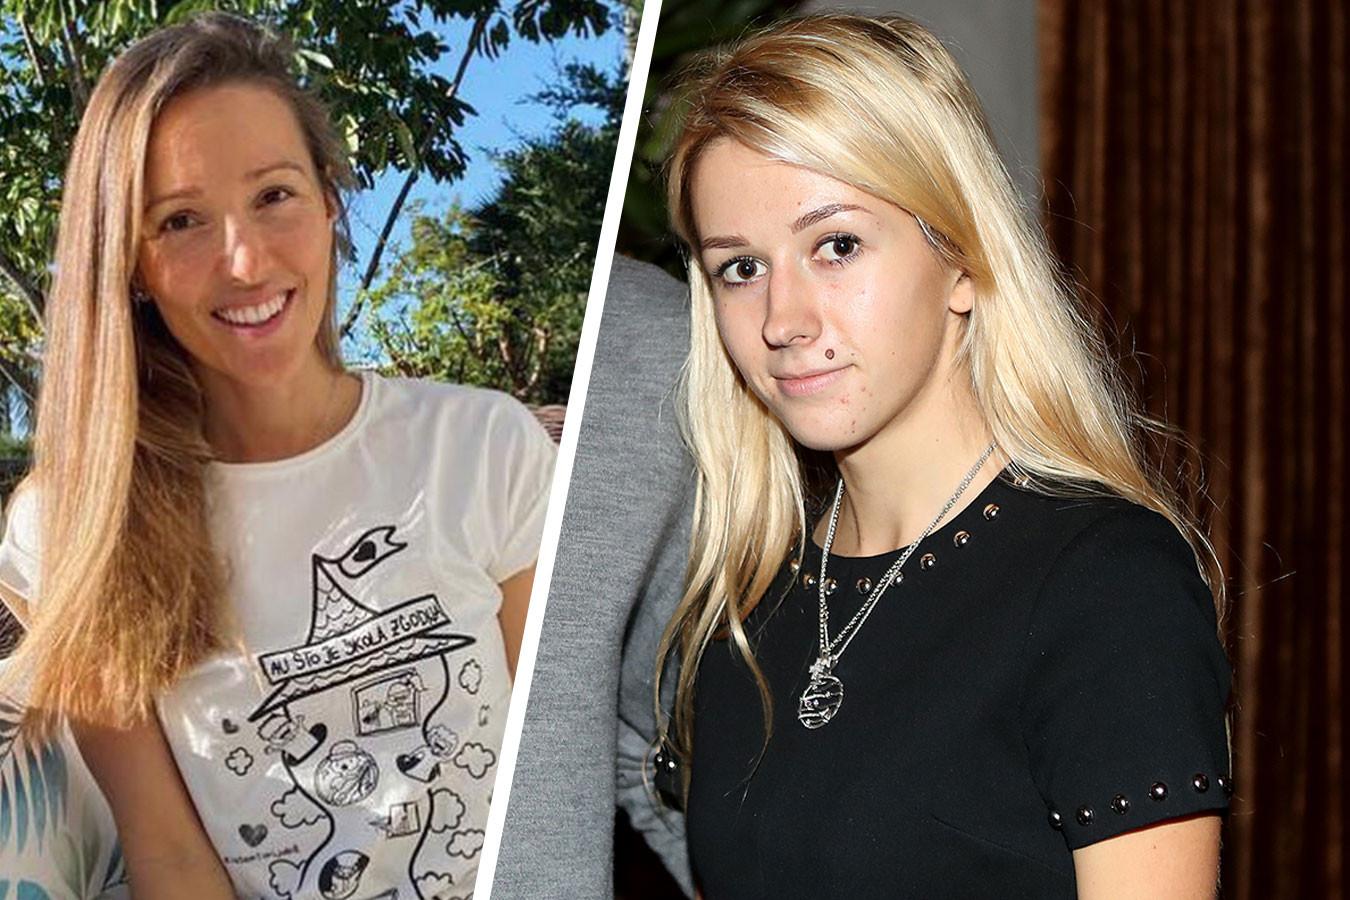 Кто вдохновляет финалистов Australian Open? Как выглядят Дарья Медведева и Елена Джокович